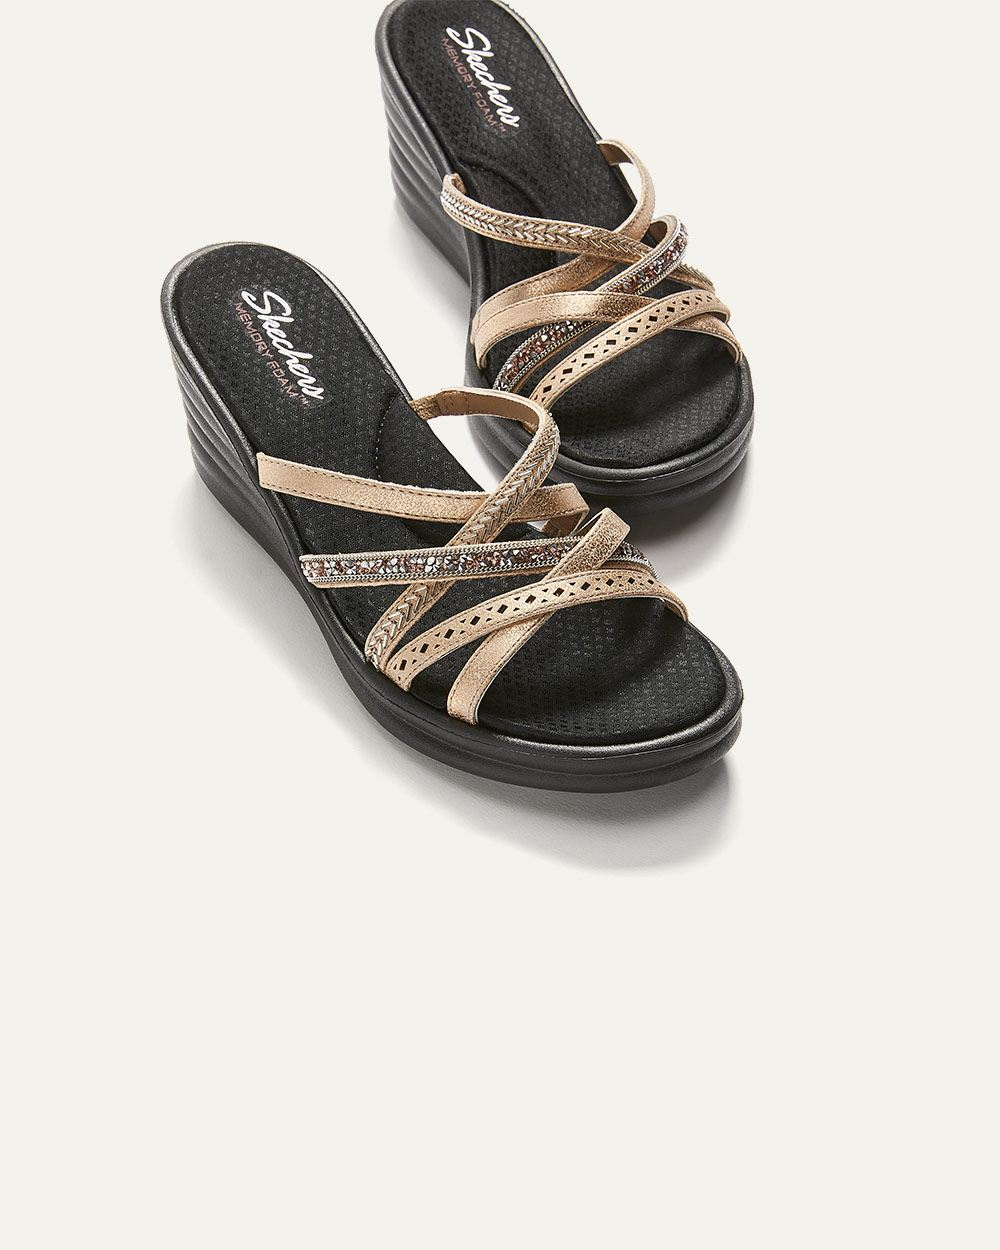 New Lassie - Wide Width Wedge Sandals